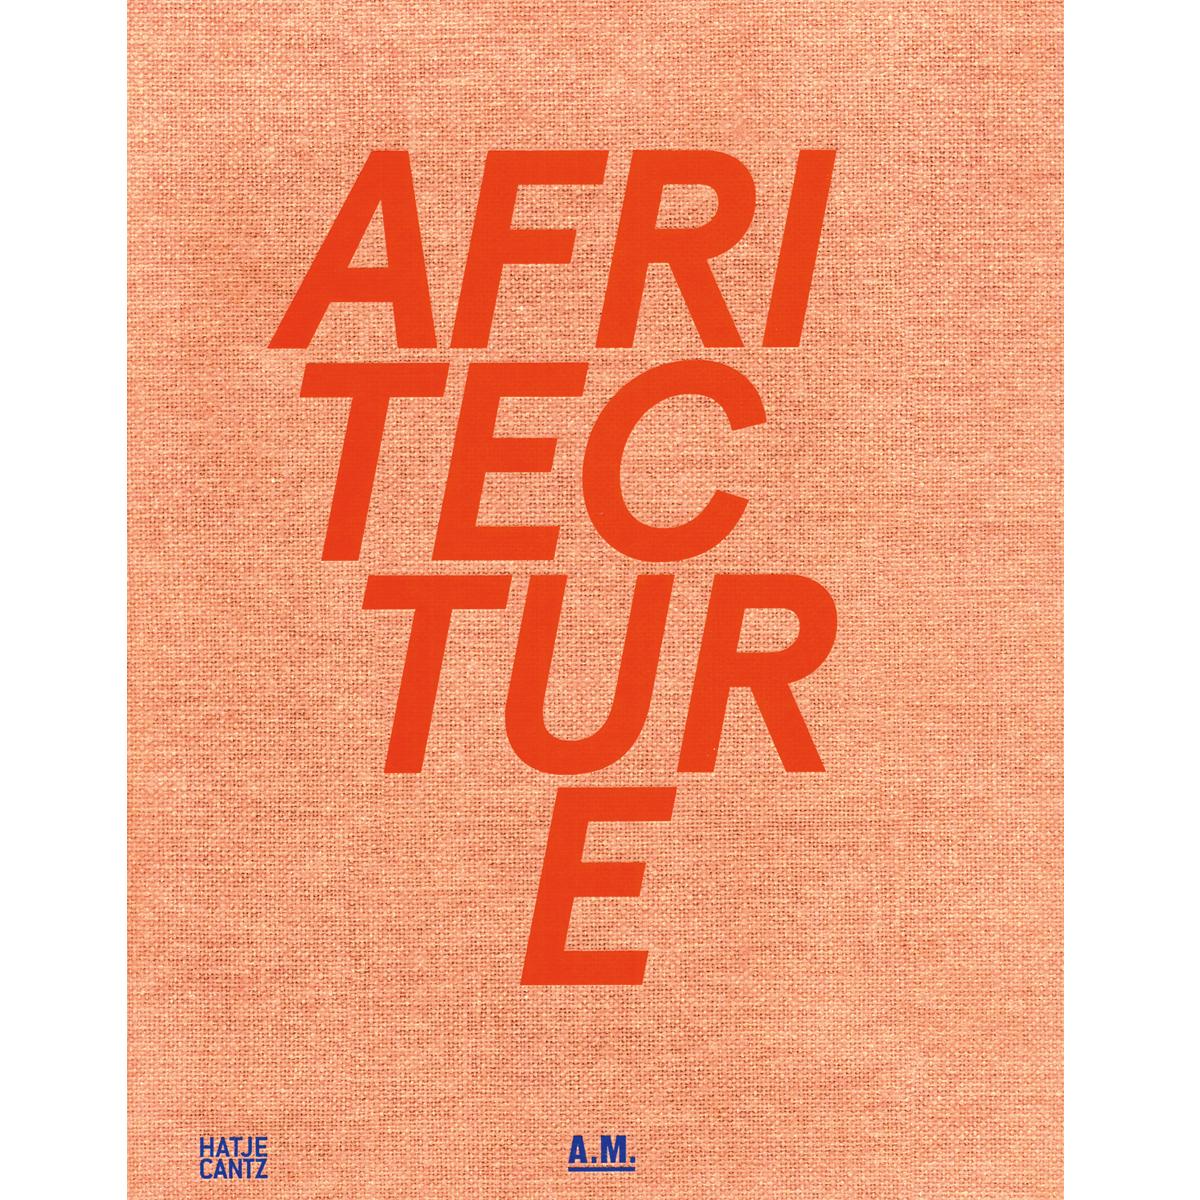 Afritecture